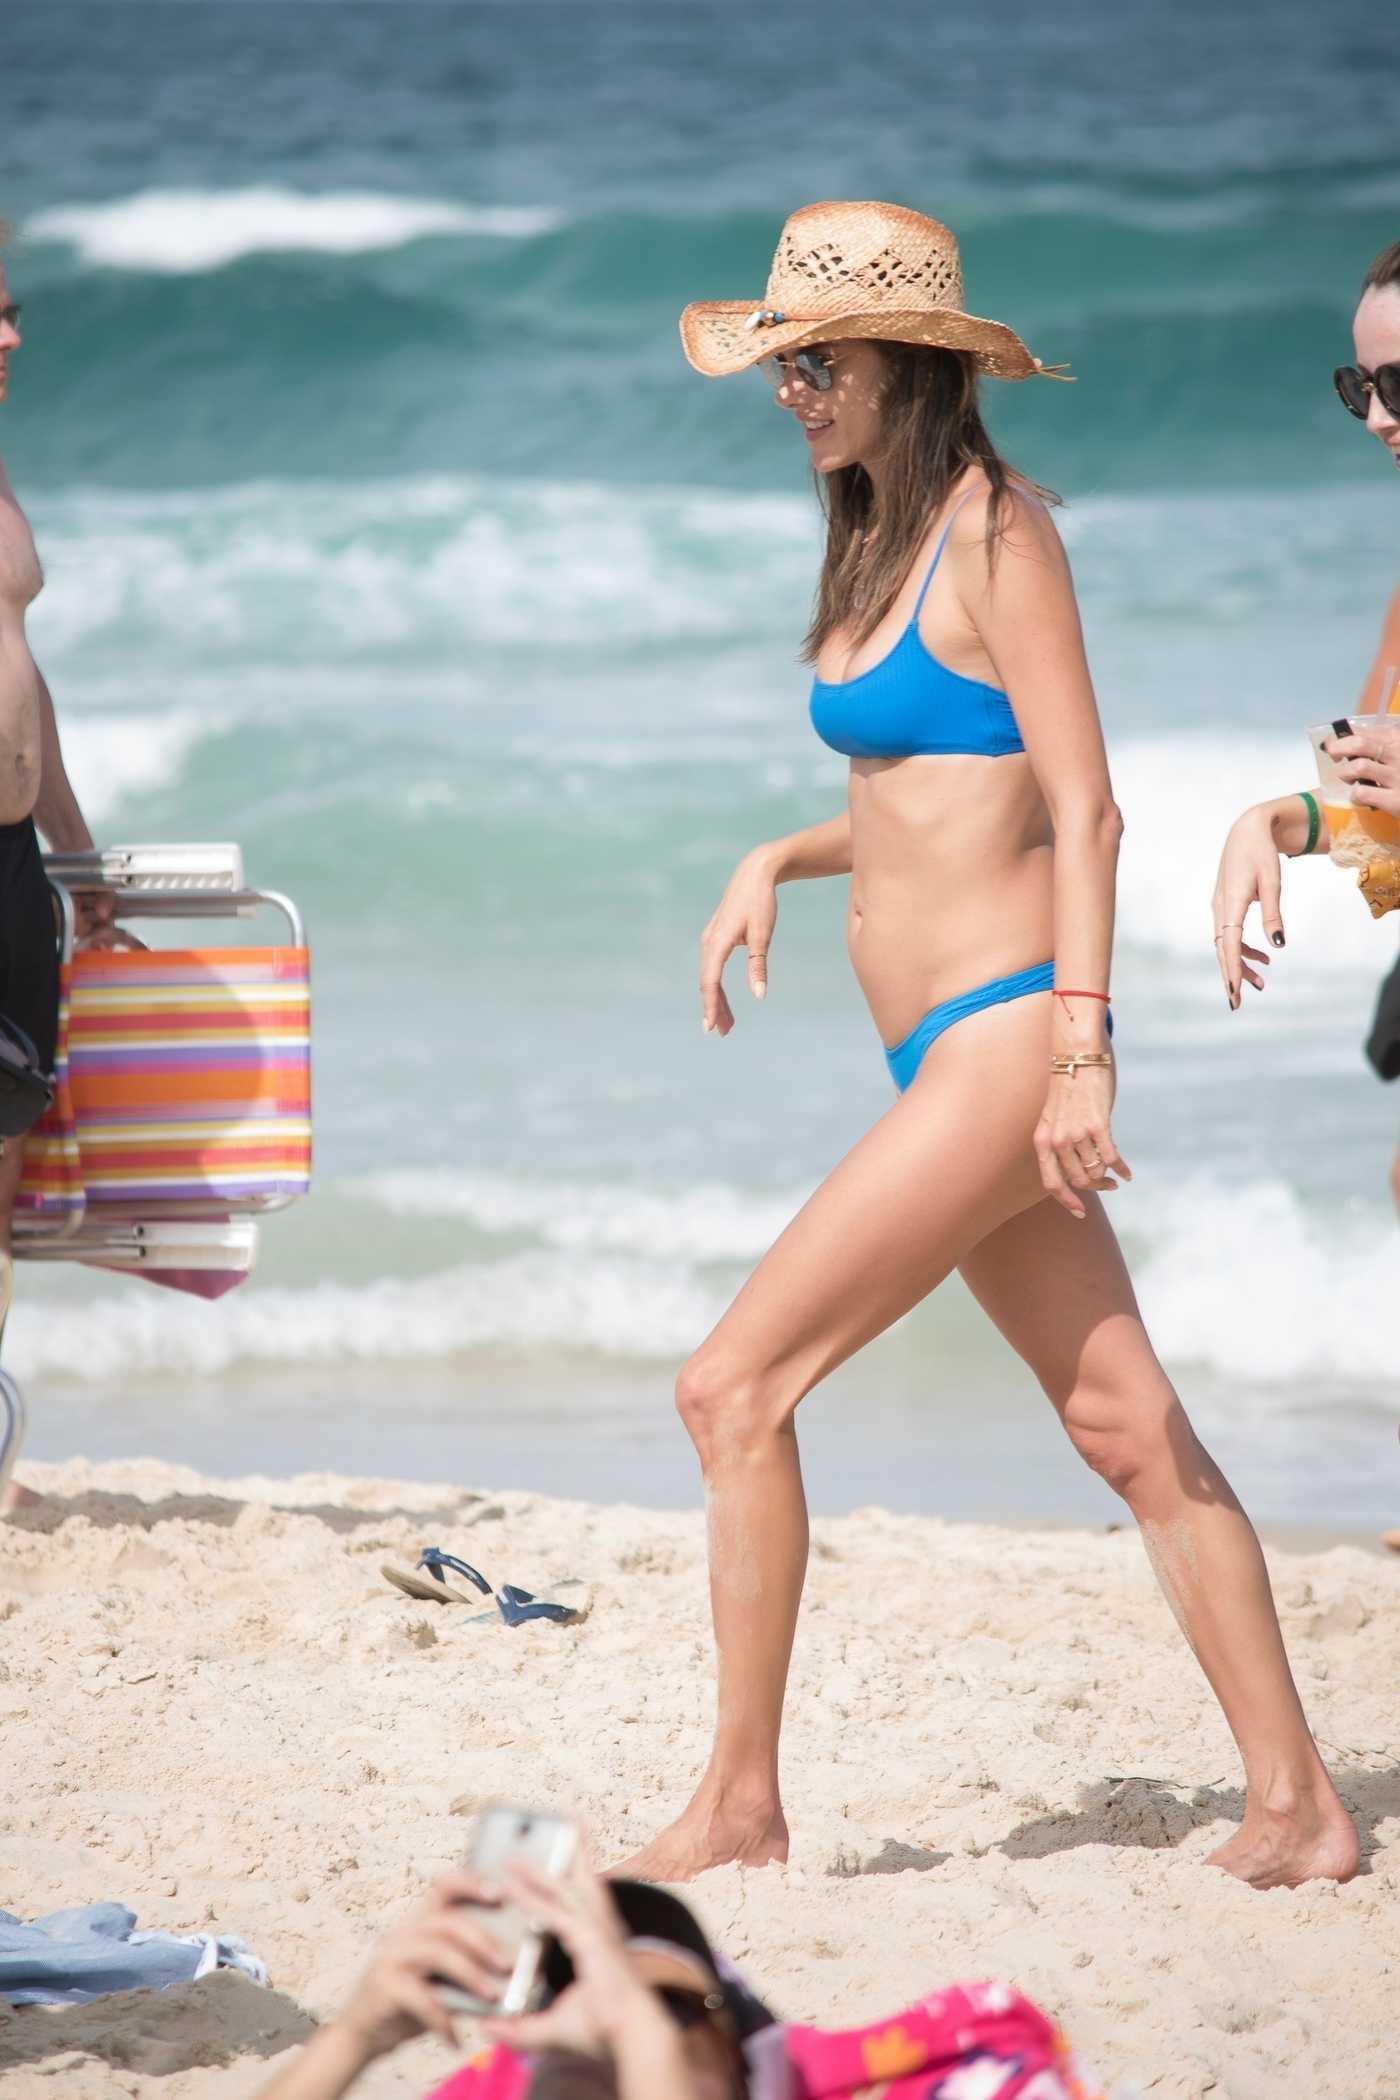 Alessandra Ambrosio in a Blue Bikini on the Beach in Florianopolis, Brazil 12/26/2018